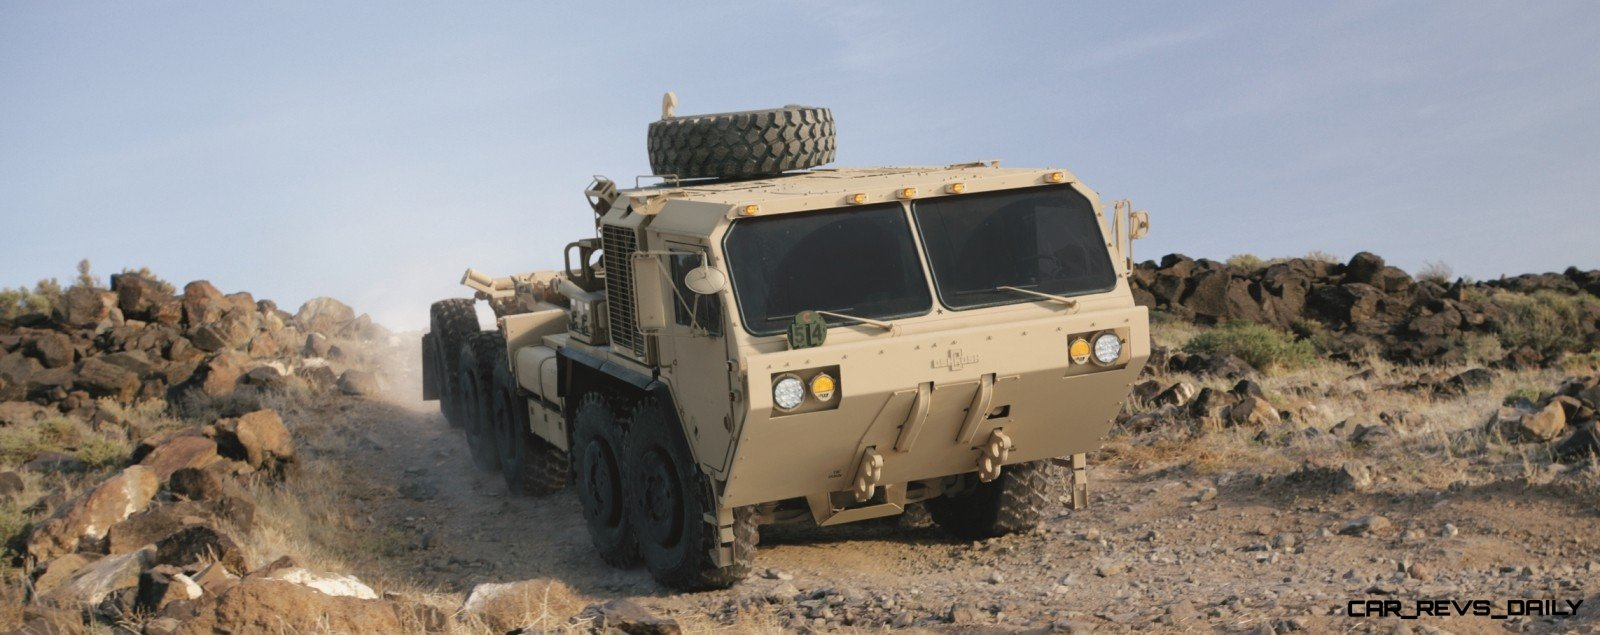 CarRevsDaily.com - Oshkosh Defense Medium and Heavy Showcase 16